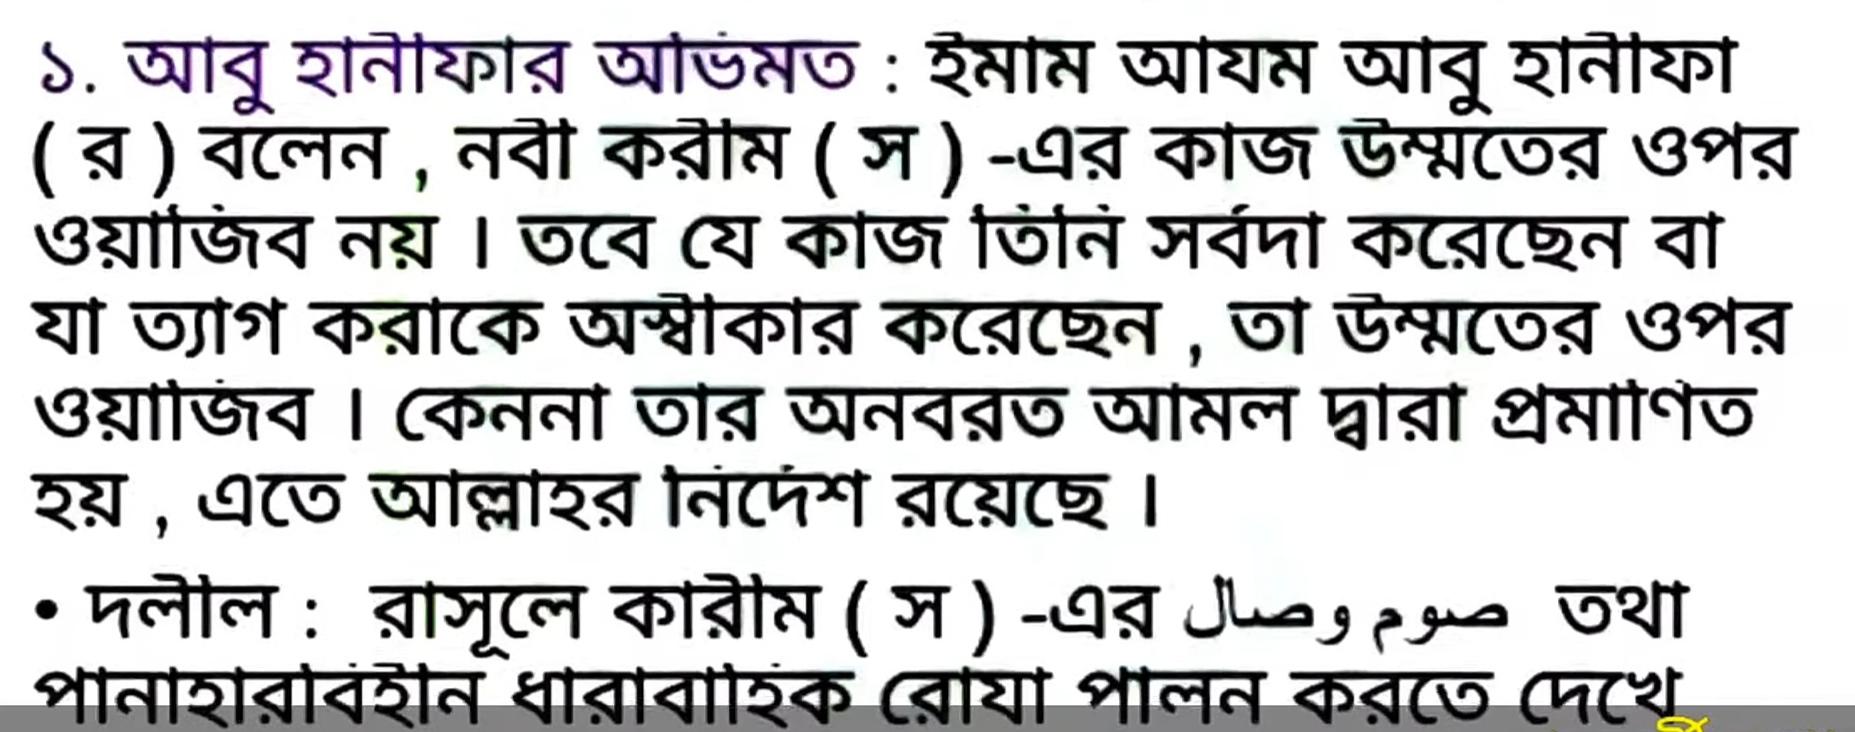 alim hsc 2021 al fiqh 2nd paper 5th week assignment answer 2021, আলিম ২০২১ পরীক্ষার্থীদের ৫ম সপ্তাহের এ্যাসাইনমেন্ট আল ফিকহ ২য় পত্র উত্তর  https://www.banglanewsexpress.com/